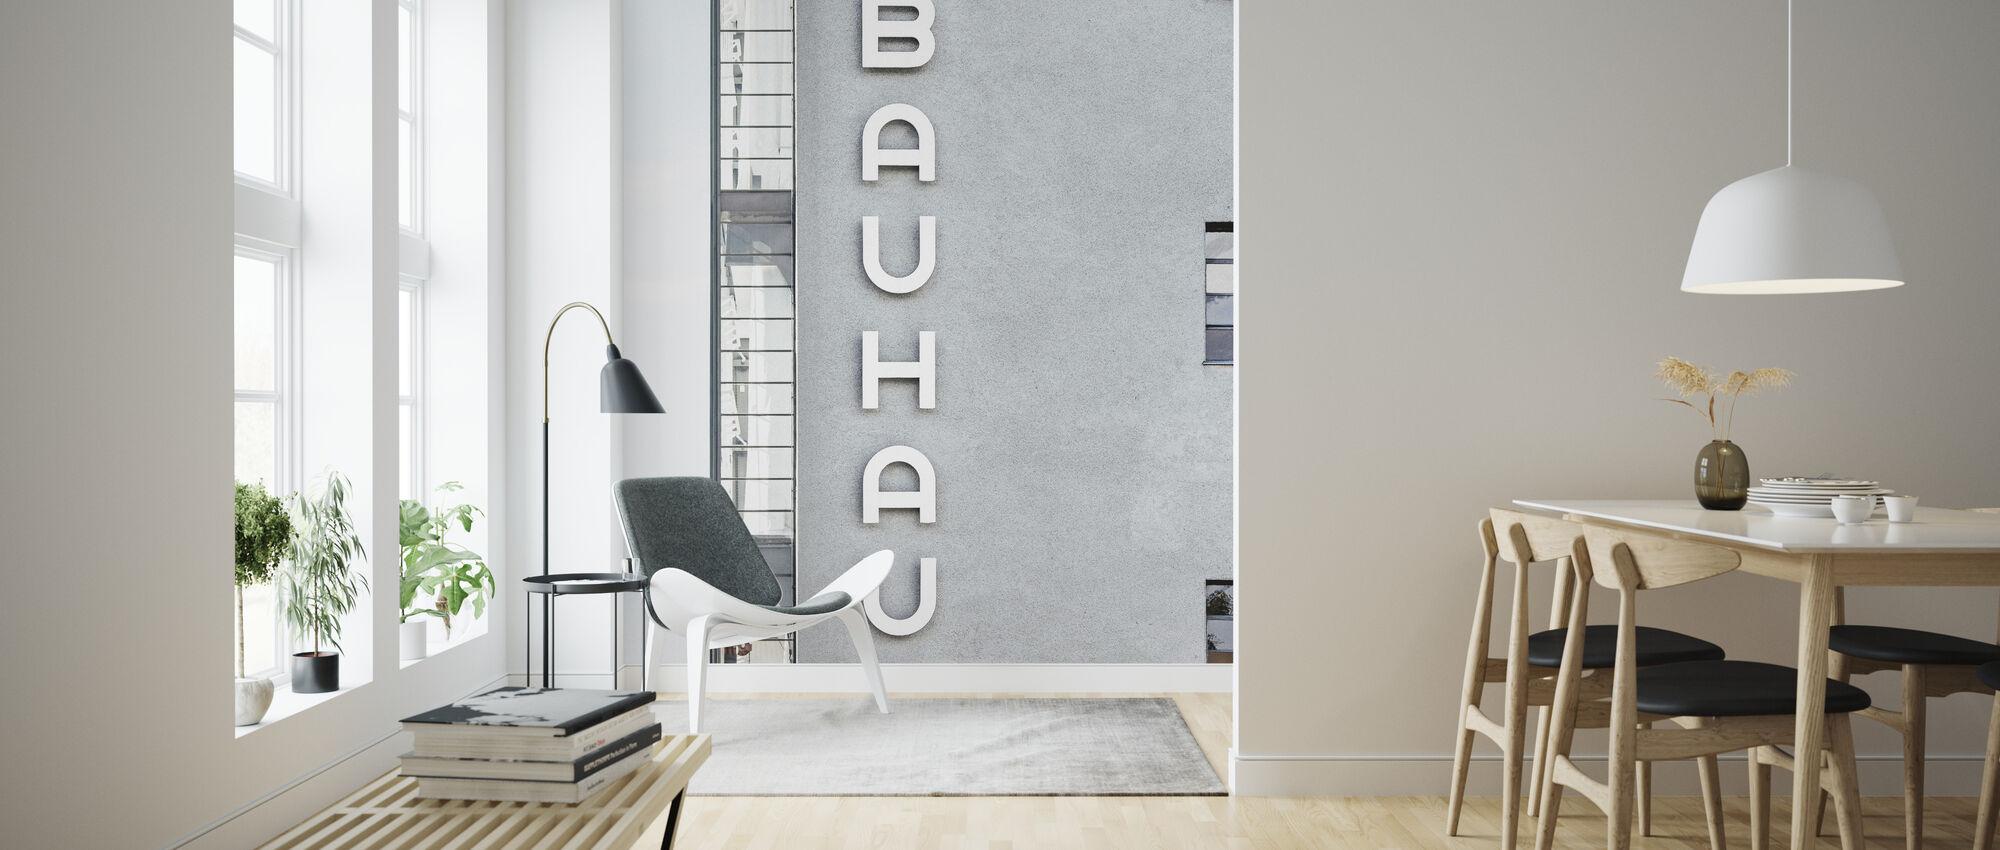 Bauhaus Building Font - Wallpaper - Living Room